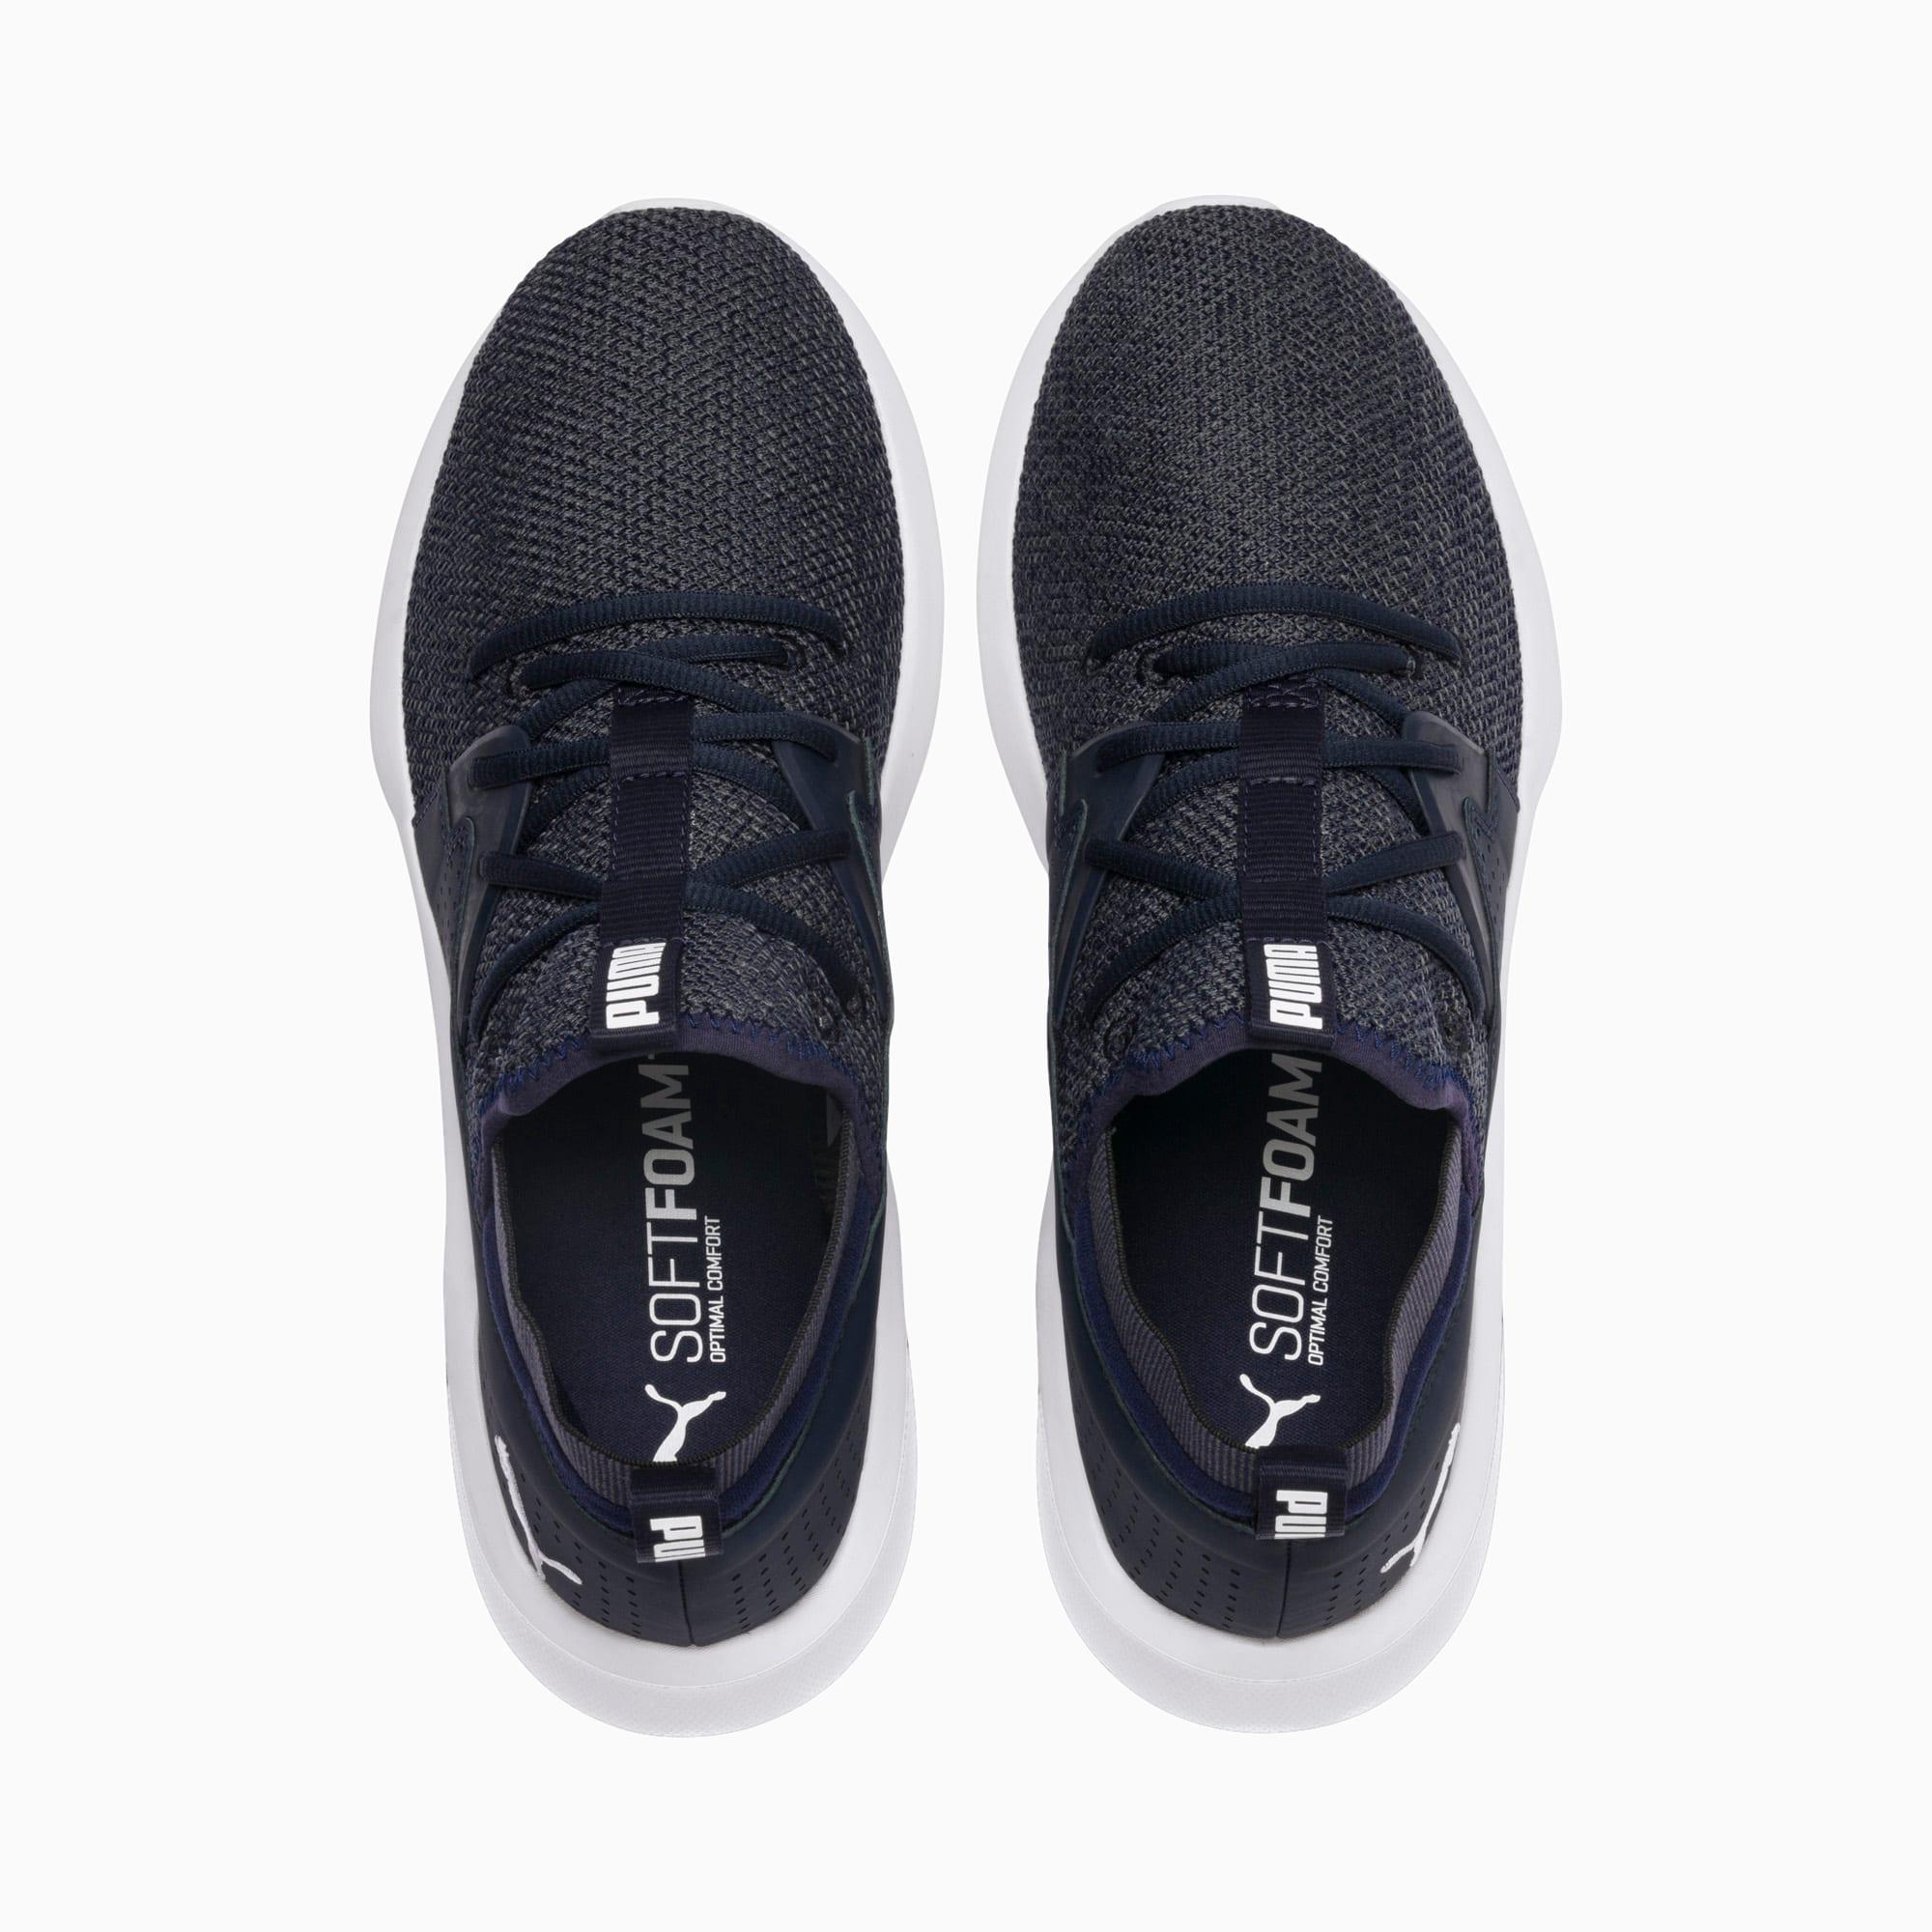 puma soft foam shoes mens